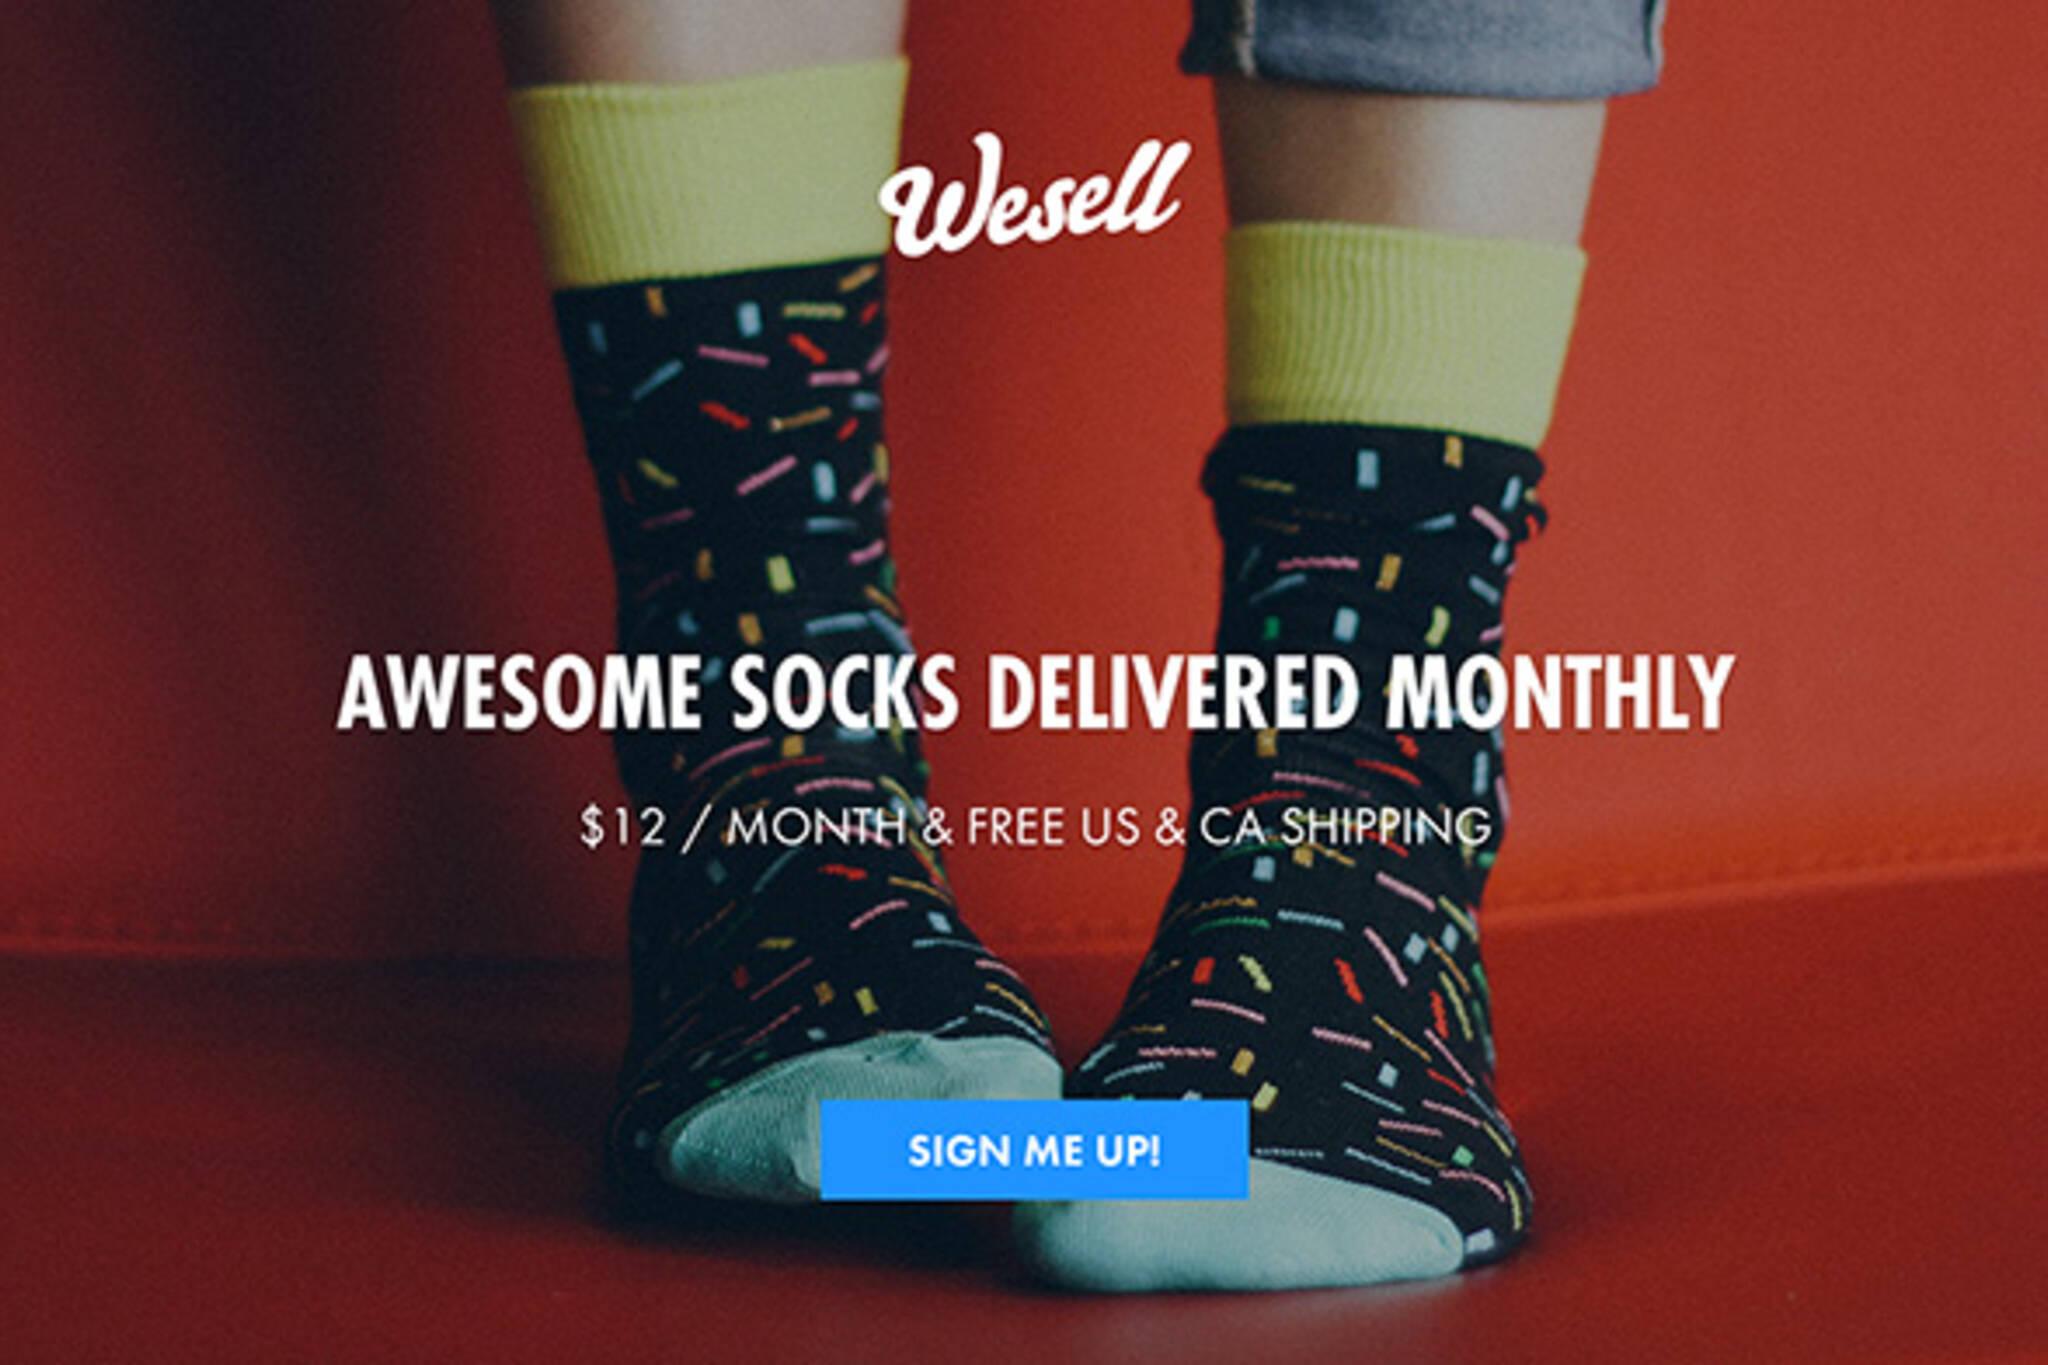 We Sell Socks Toronto